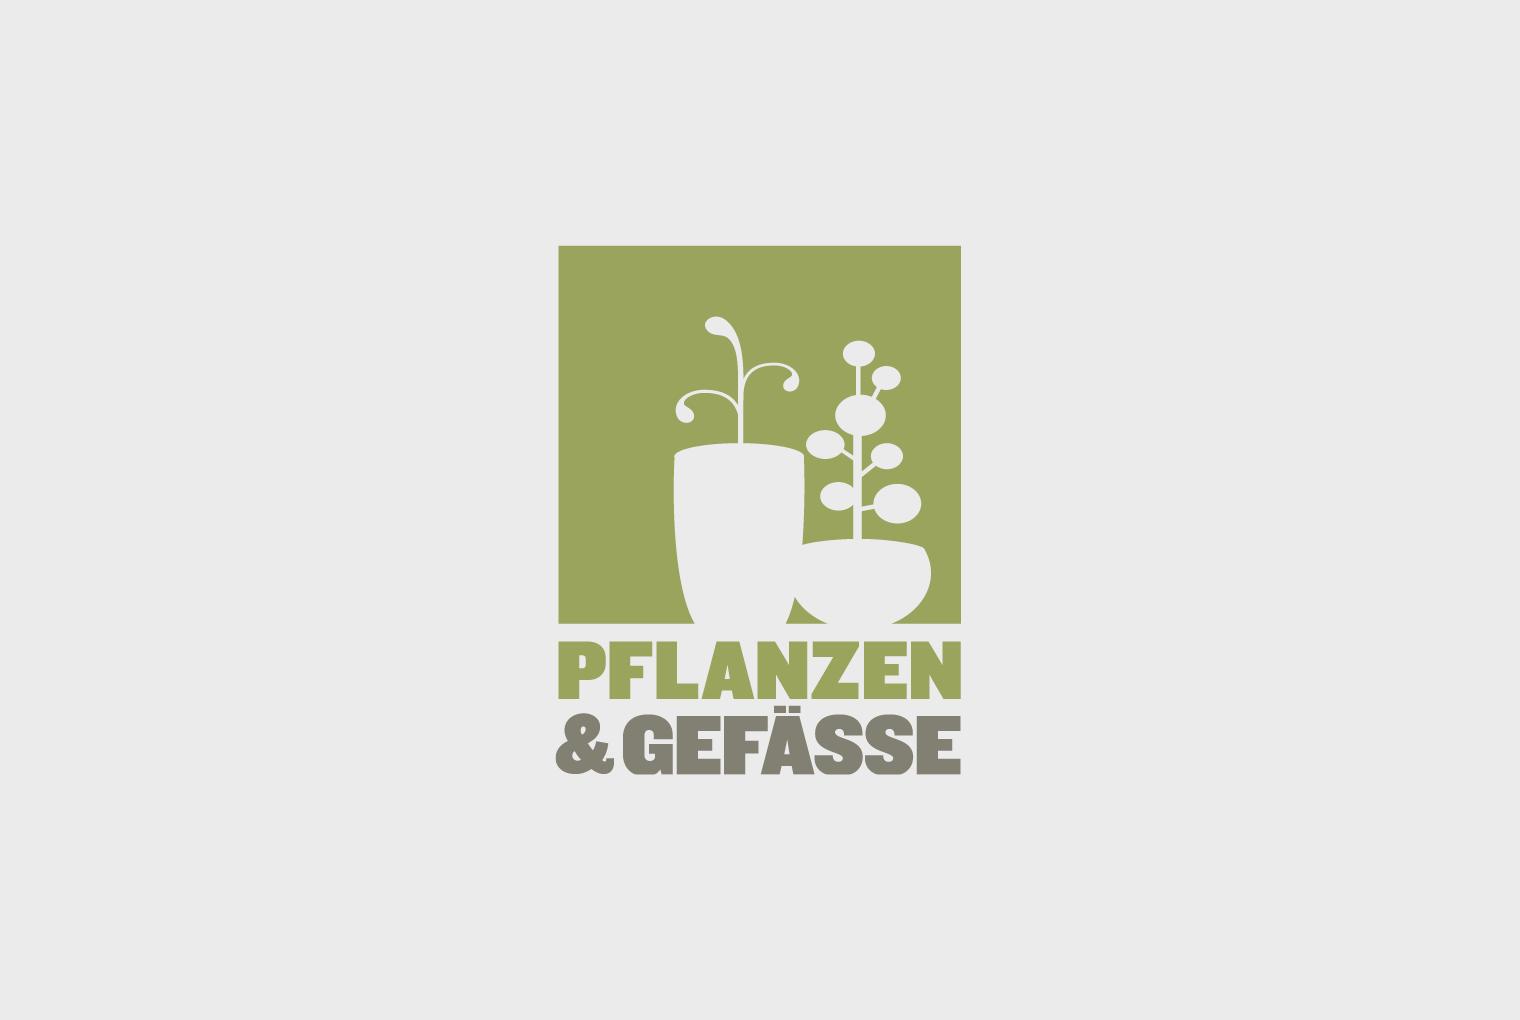 Logos_15_Pflanzen_Gefaesse